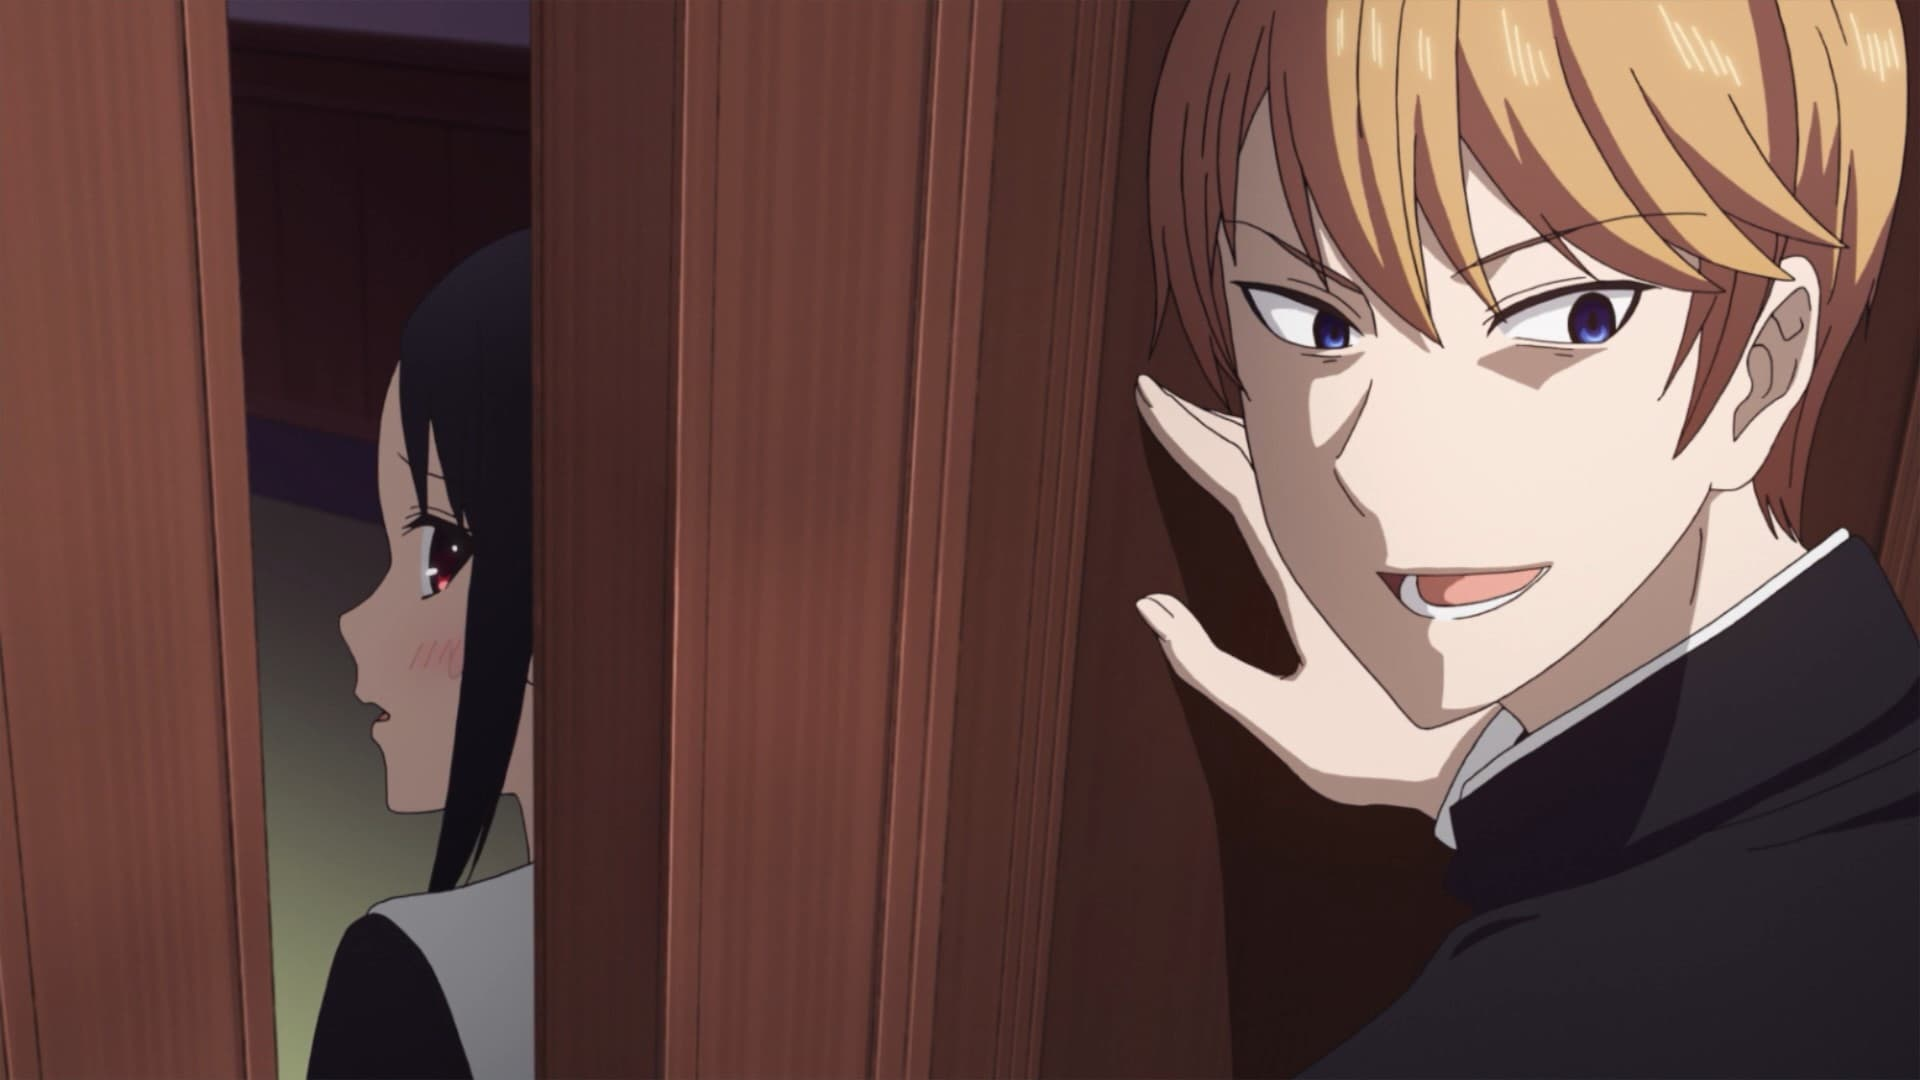 Kaguya-sama: Love is War Season 1 :Episode 2  Kaguya Wants to Trade / Chika Wants to Go Somewhere / Miyuki Wants to Hide His Ignorance